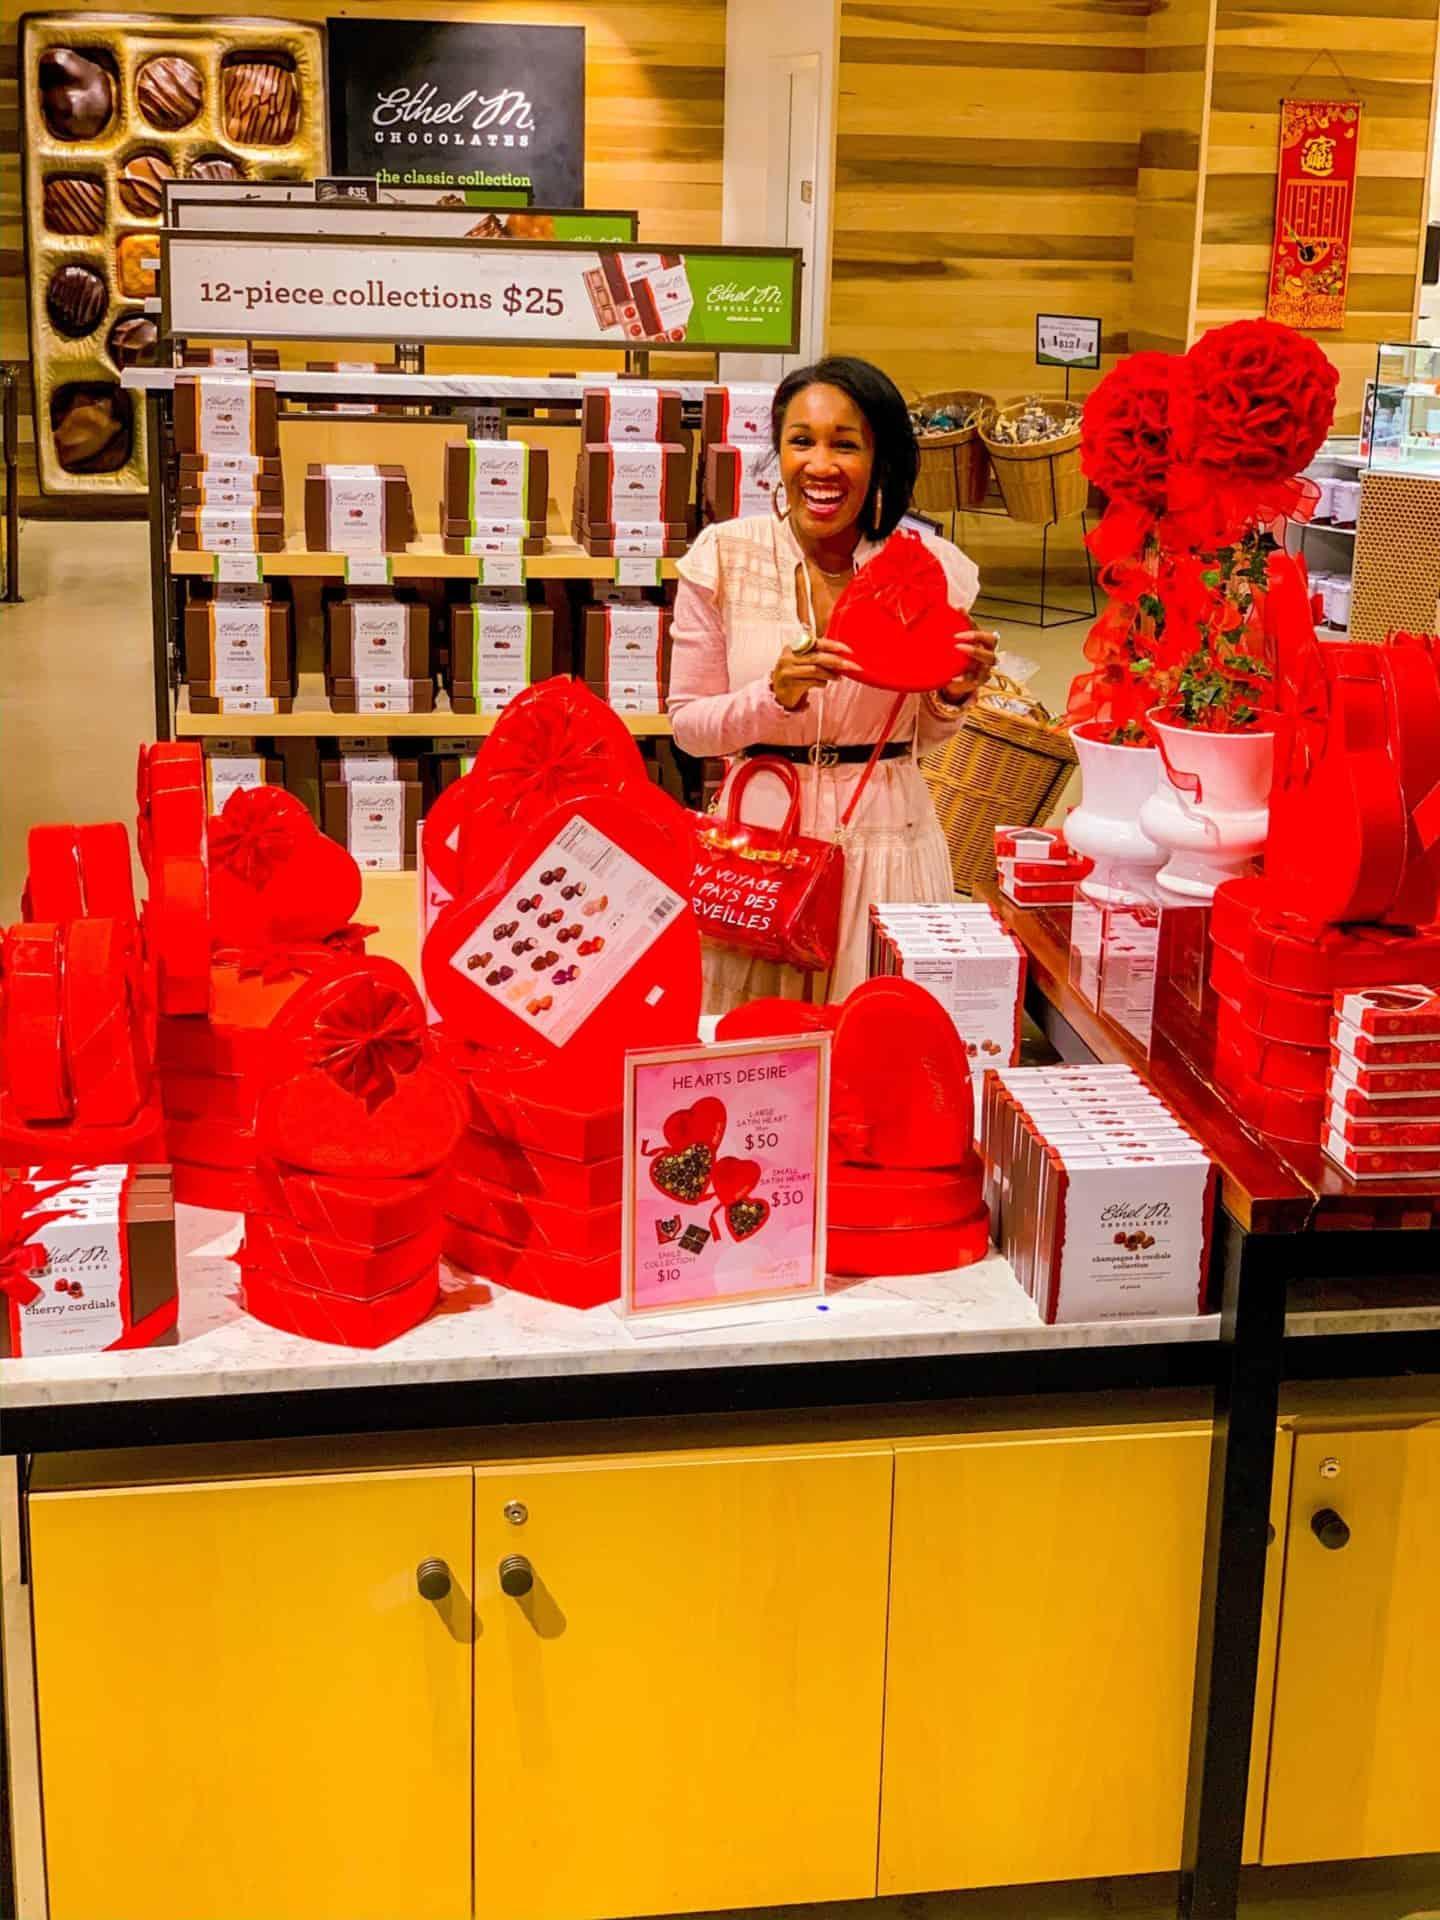 Ethel M Chocolates Exclusive Valentine's Day Tasting Experiences